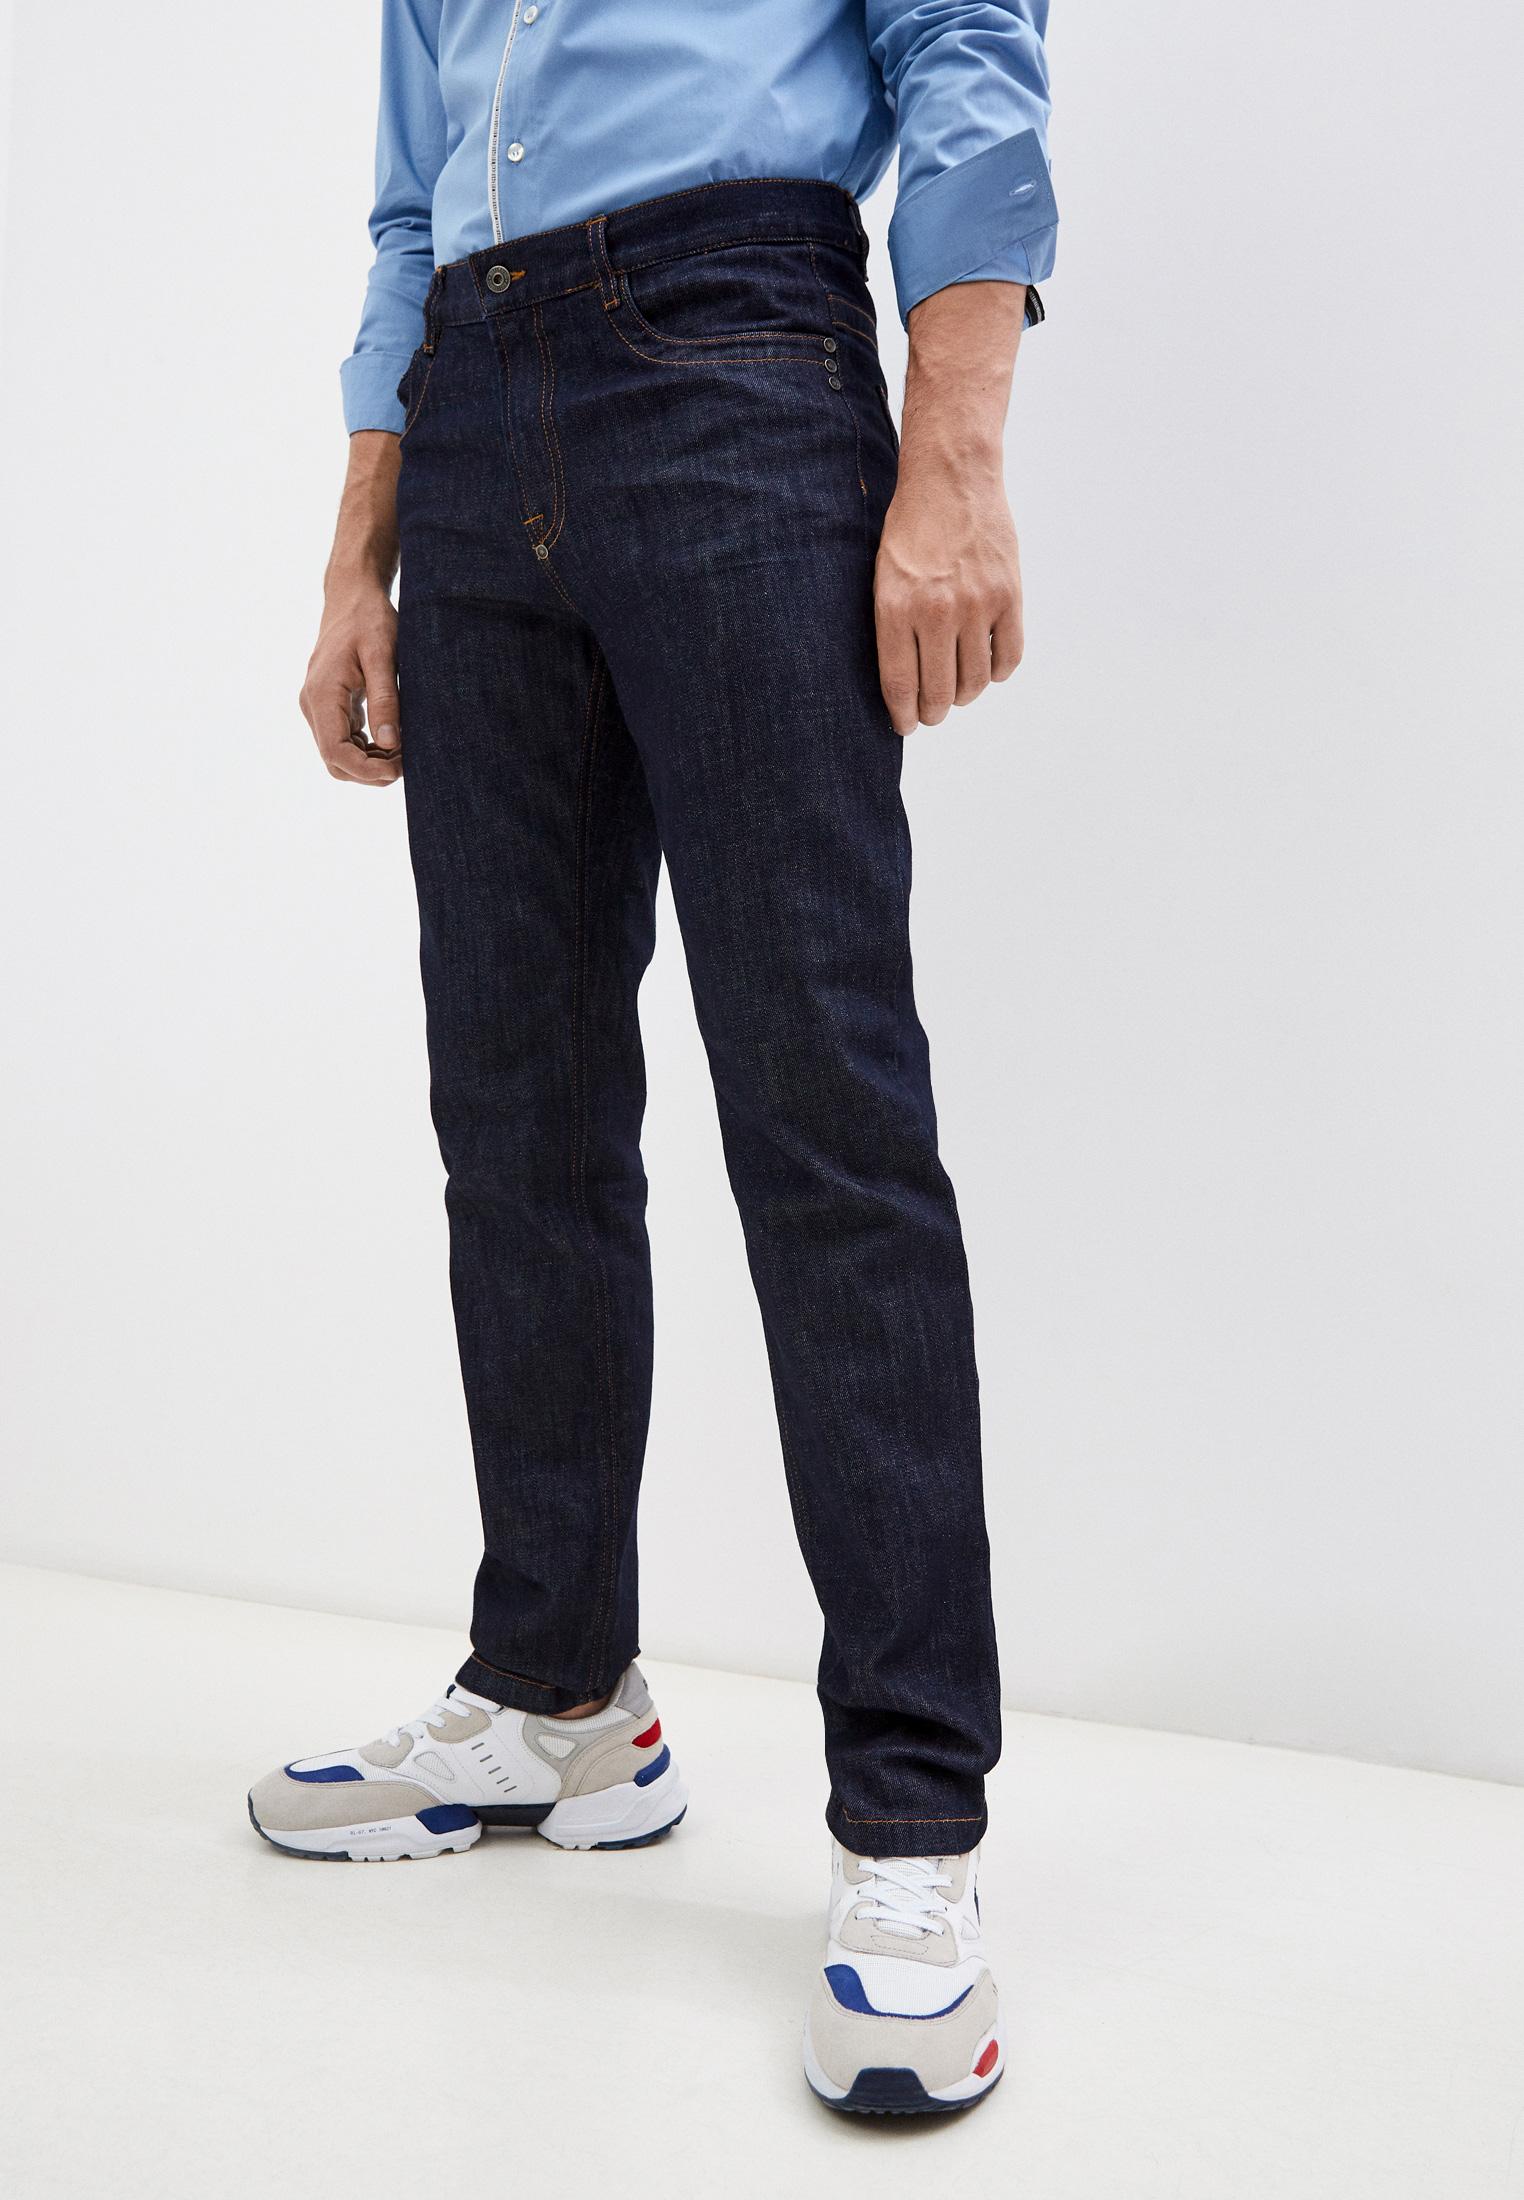 Мужские прямые джинсы Bikkembergs (Биккембергс) C Q 102 09 S 3393